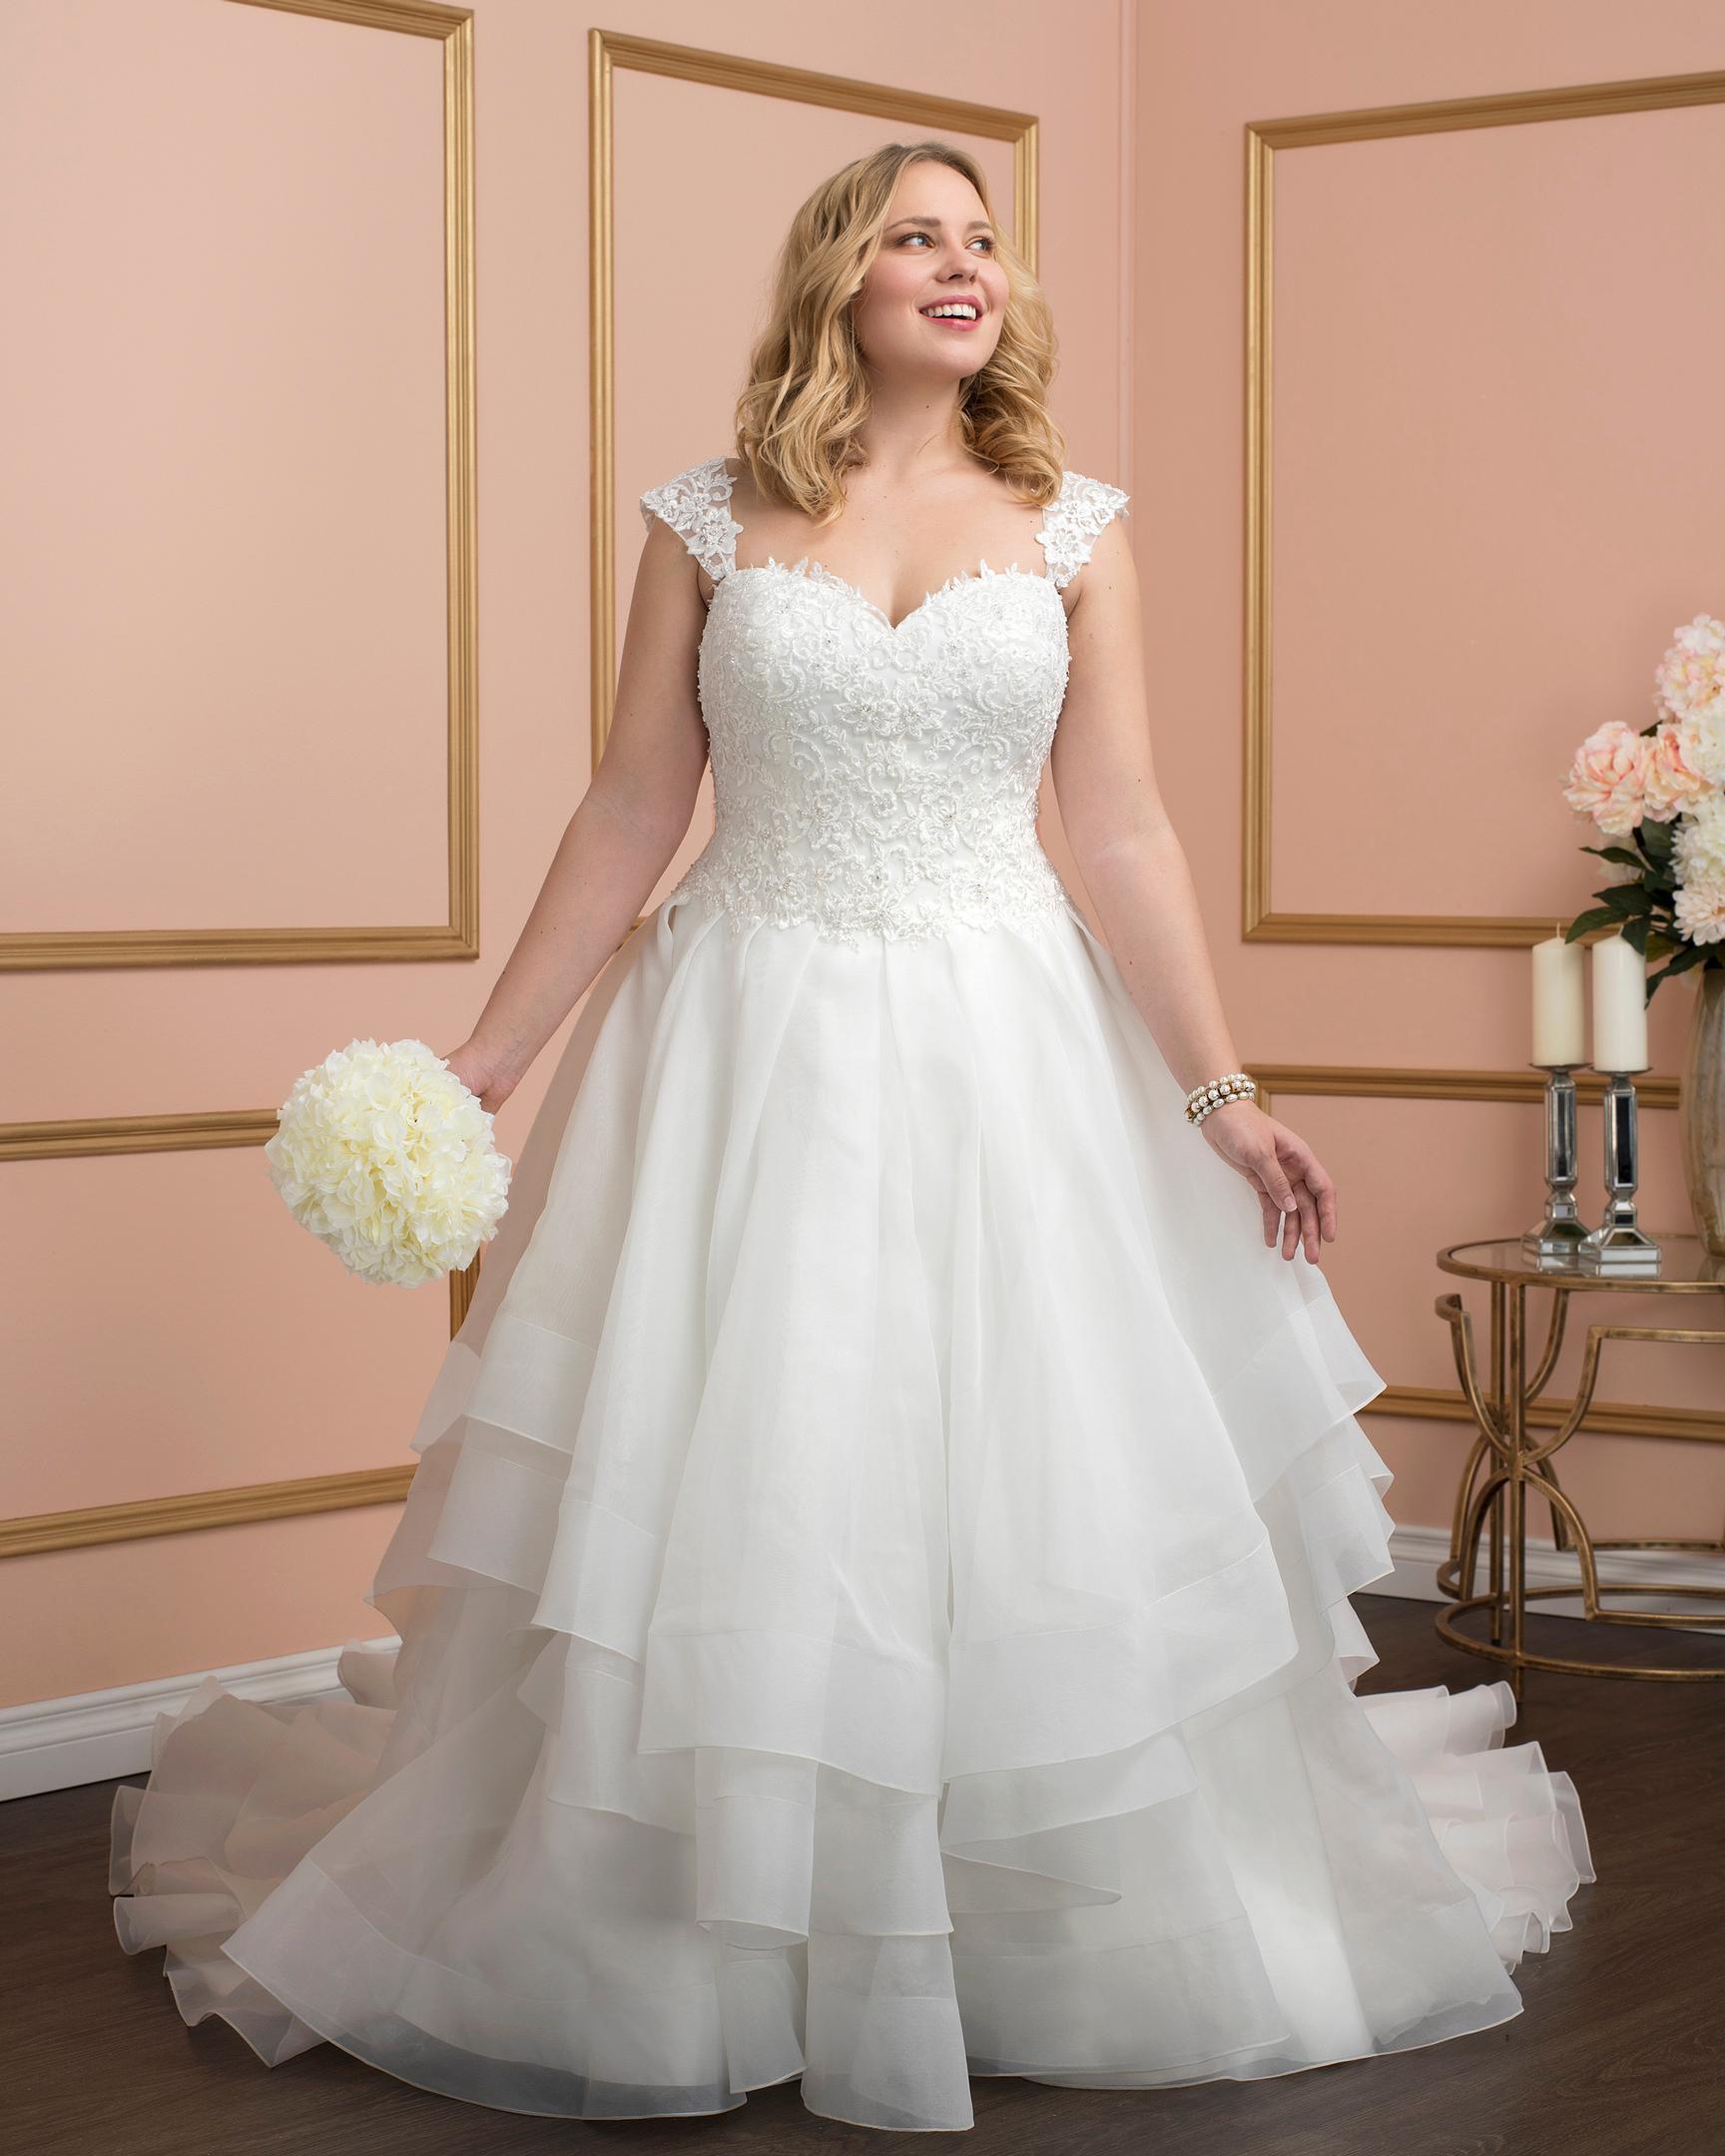 The Curvy Bride | Manalapan Township, NJ